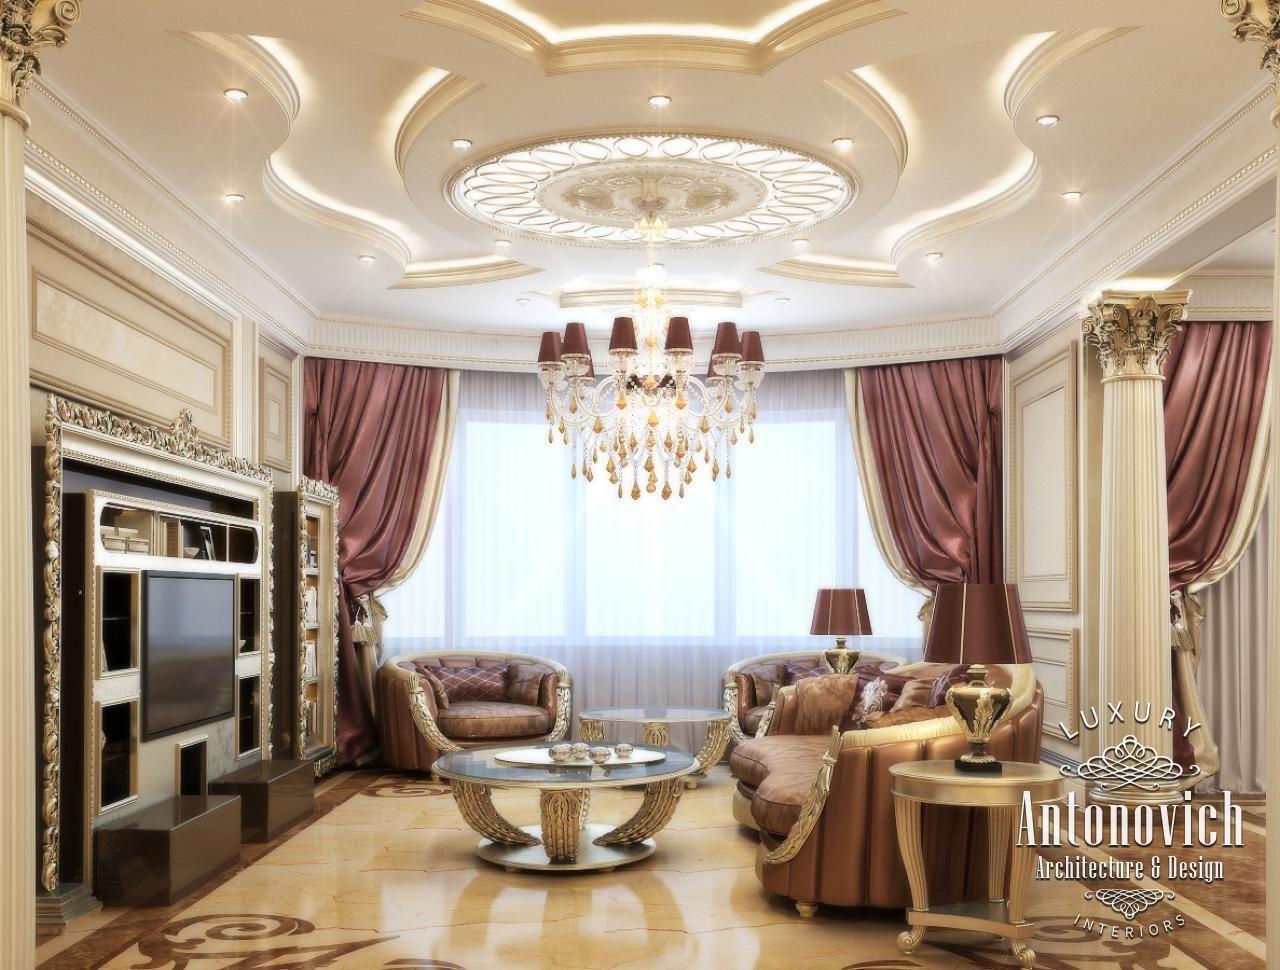 Living Room Designs In Dubai apartment interior design in dubai, down tower, dubai, photo 2